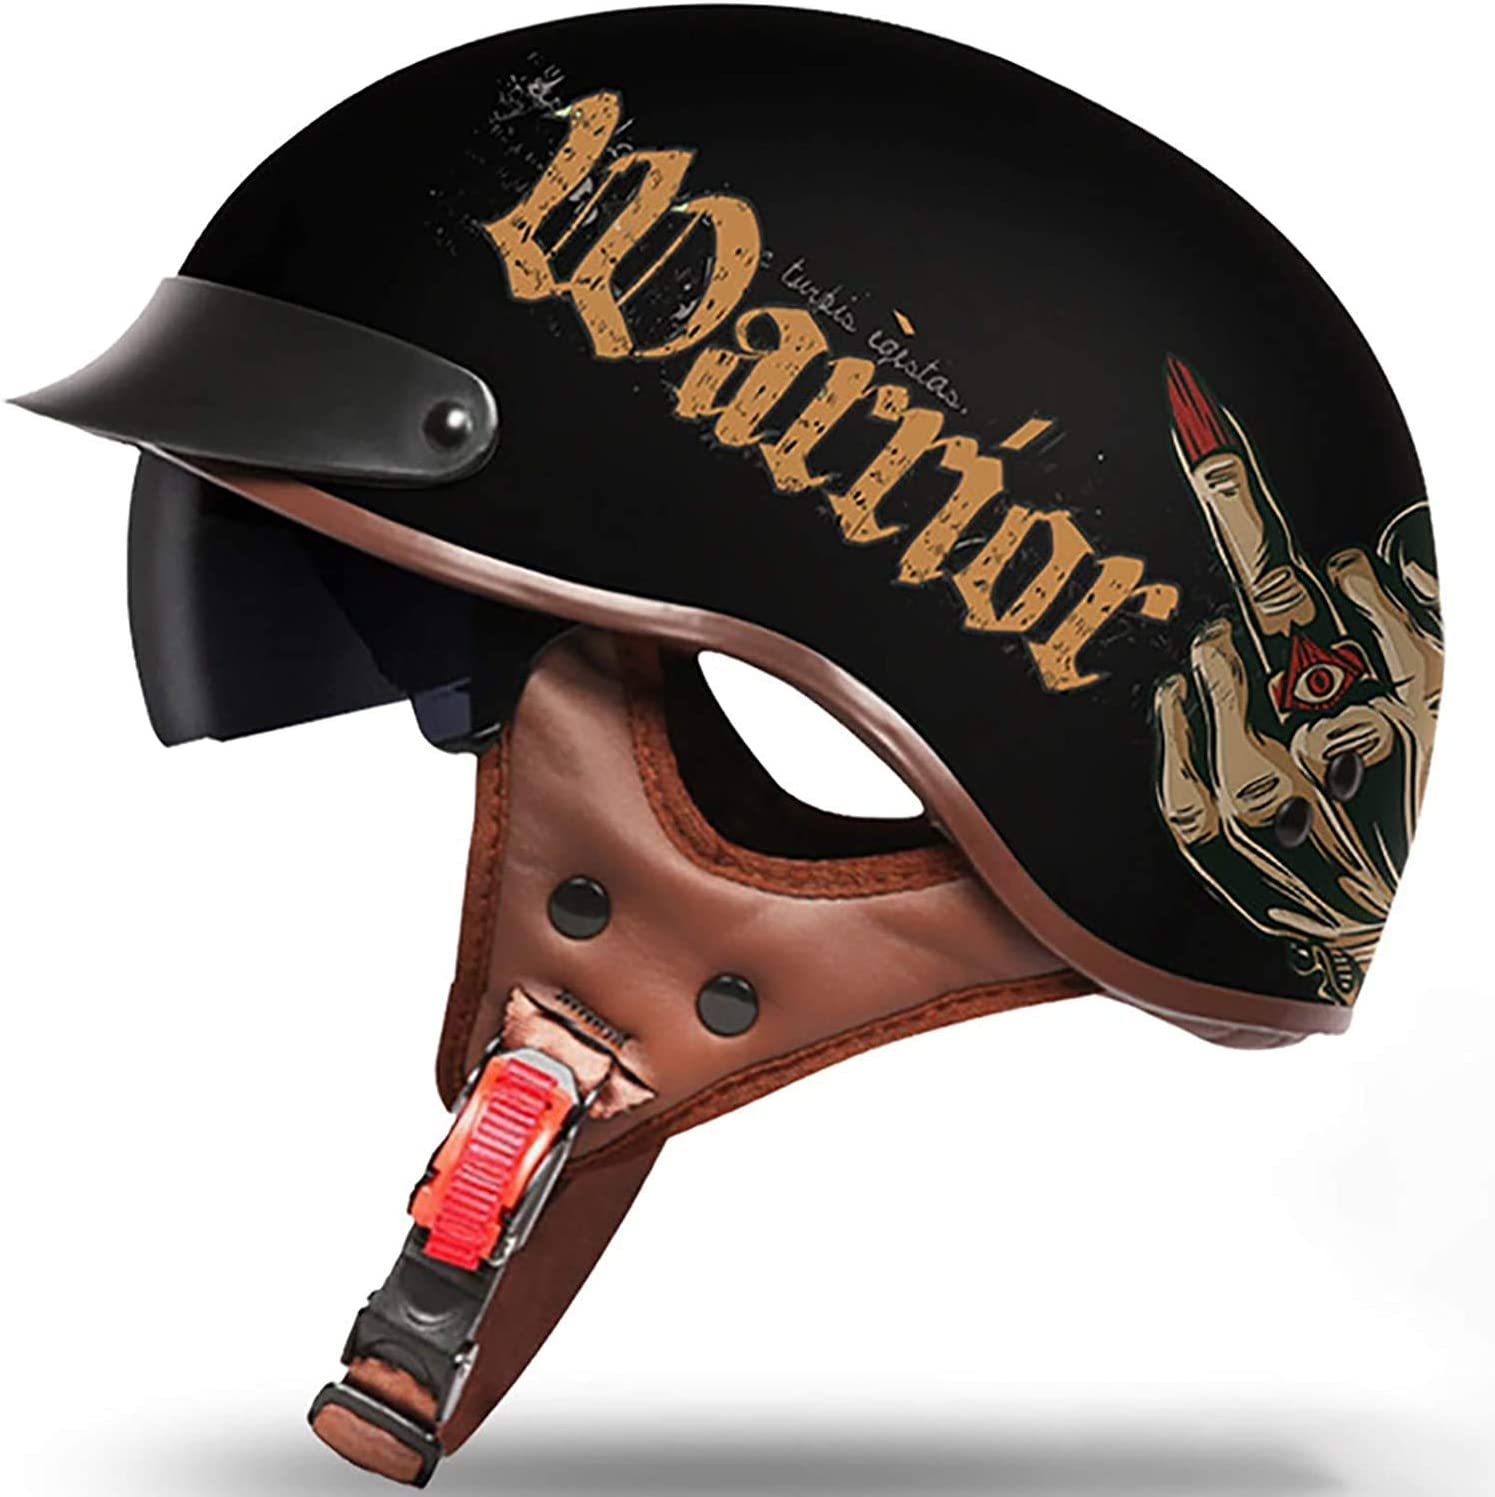 Superior DQ-Walker Half Helmet Motorbike Retro He Animer and price revision Motorcycle